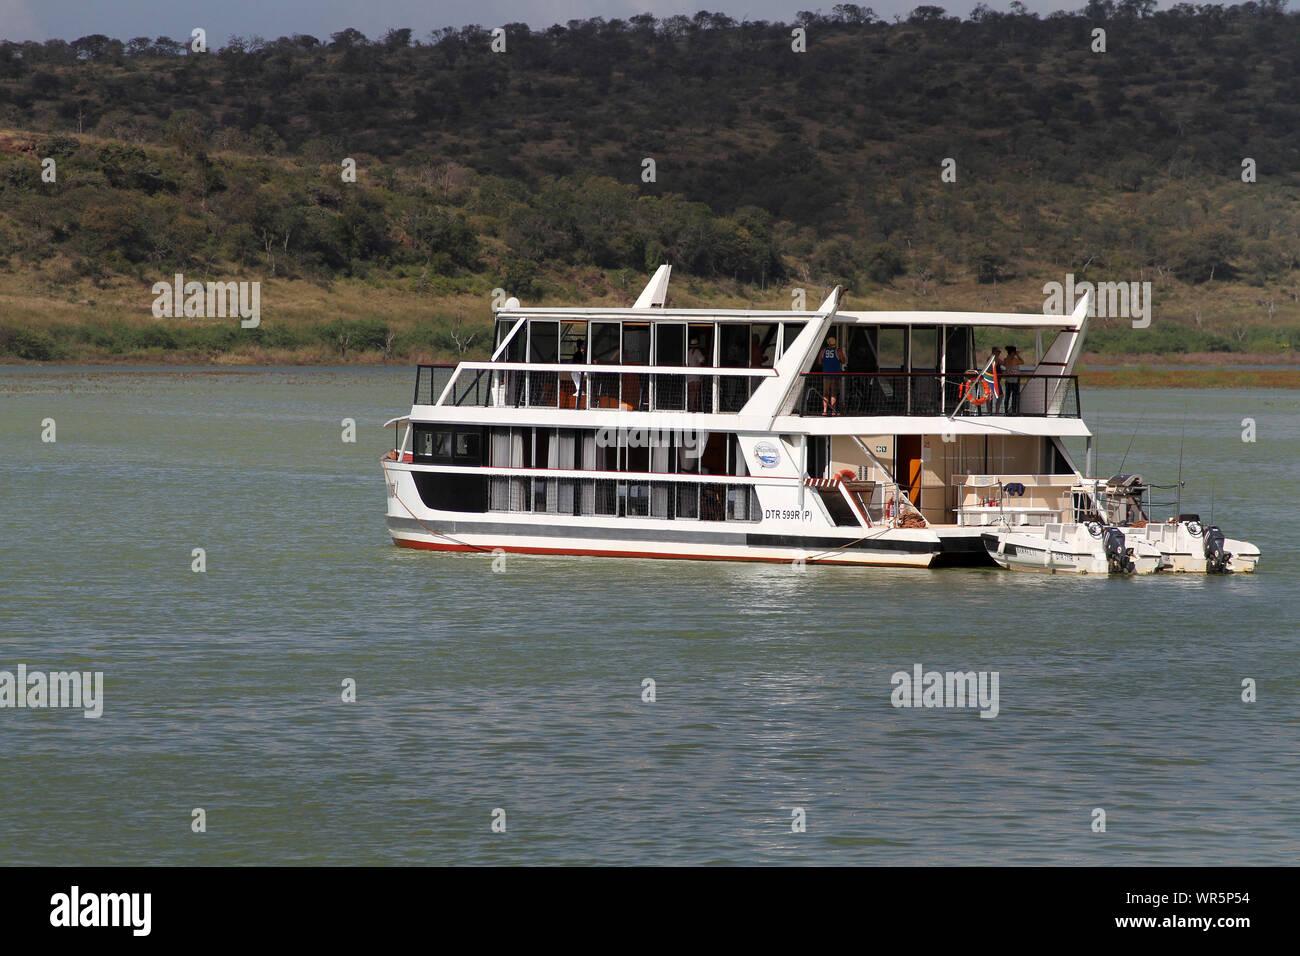 Boat cruise, Pongolapoort Dam, South Africa Stock Photo